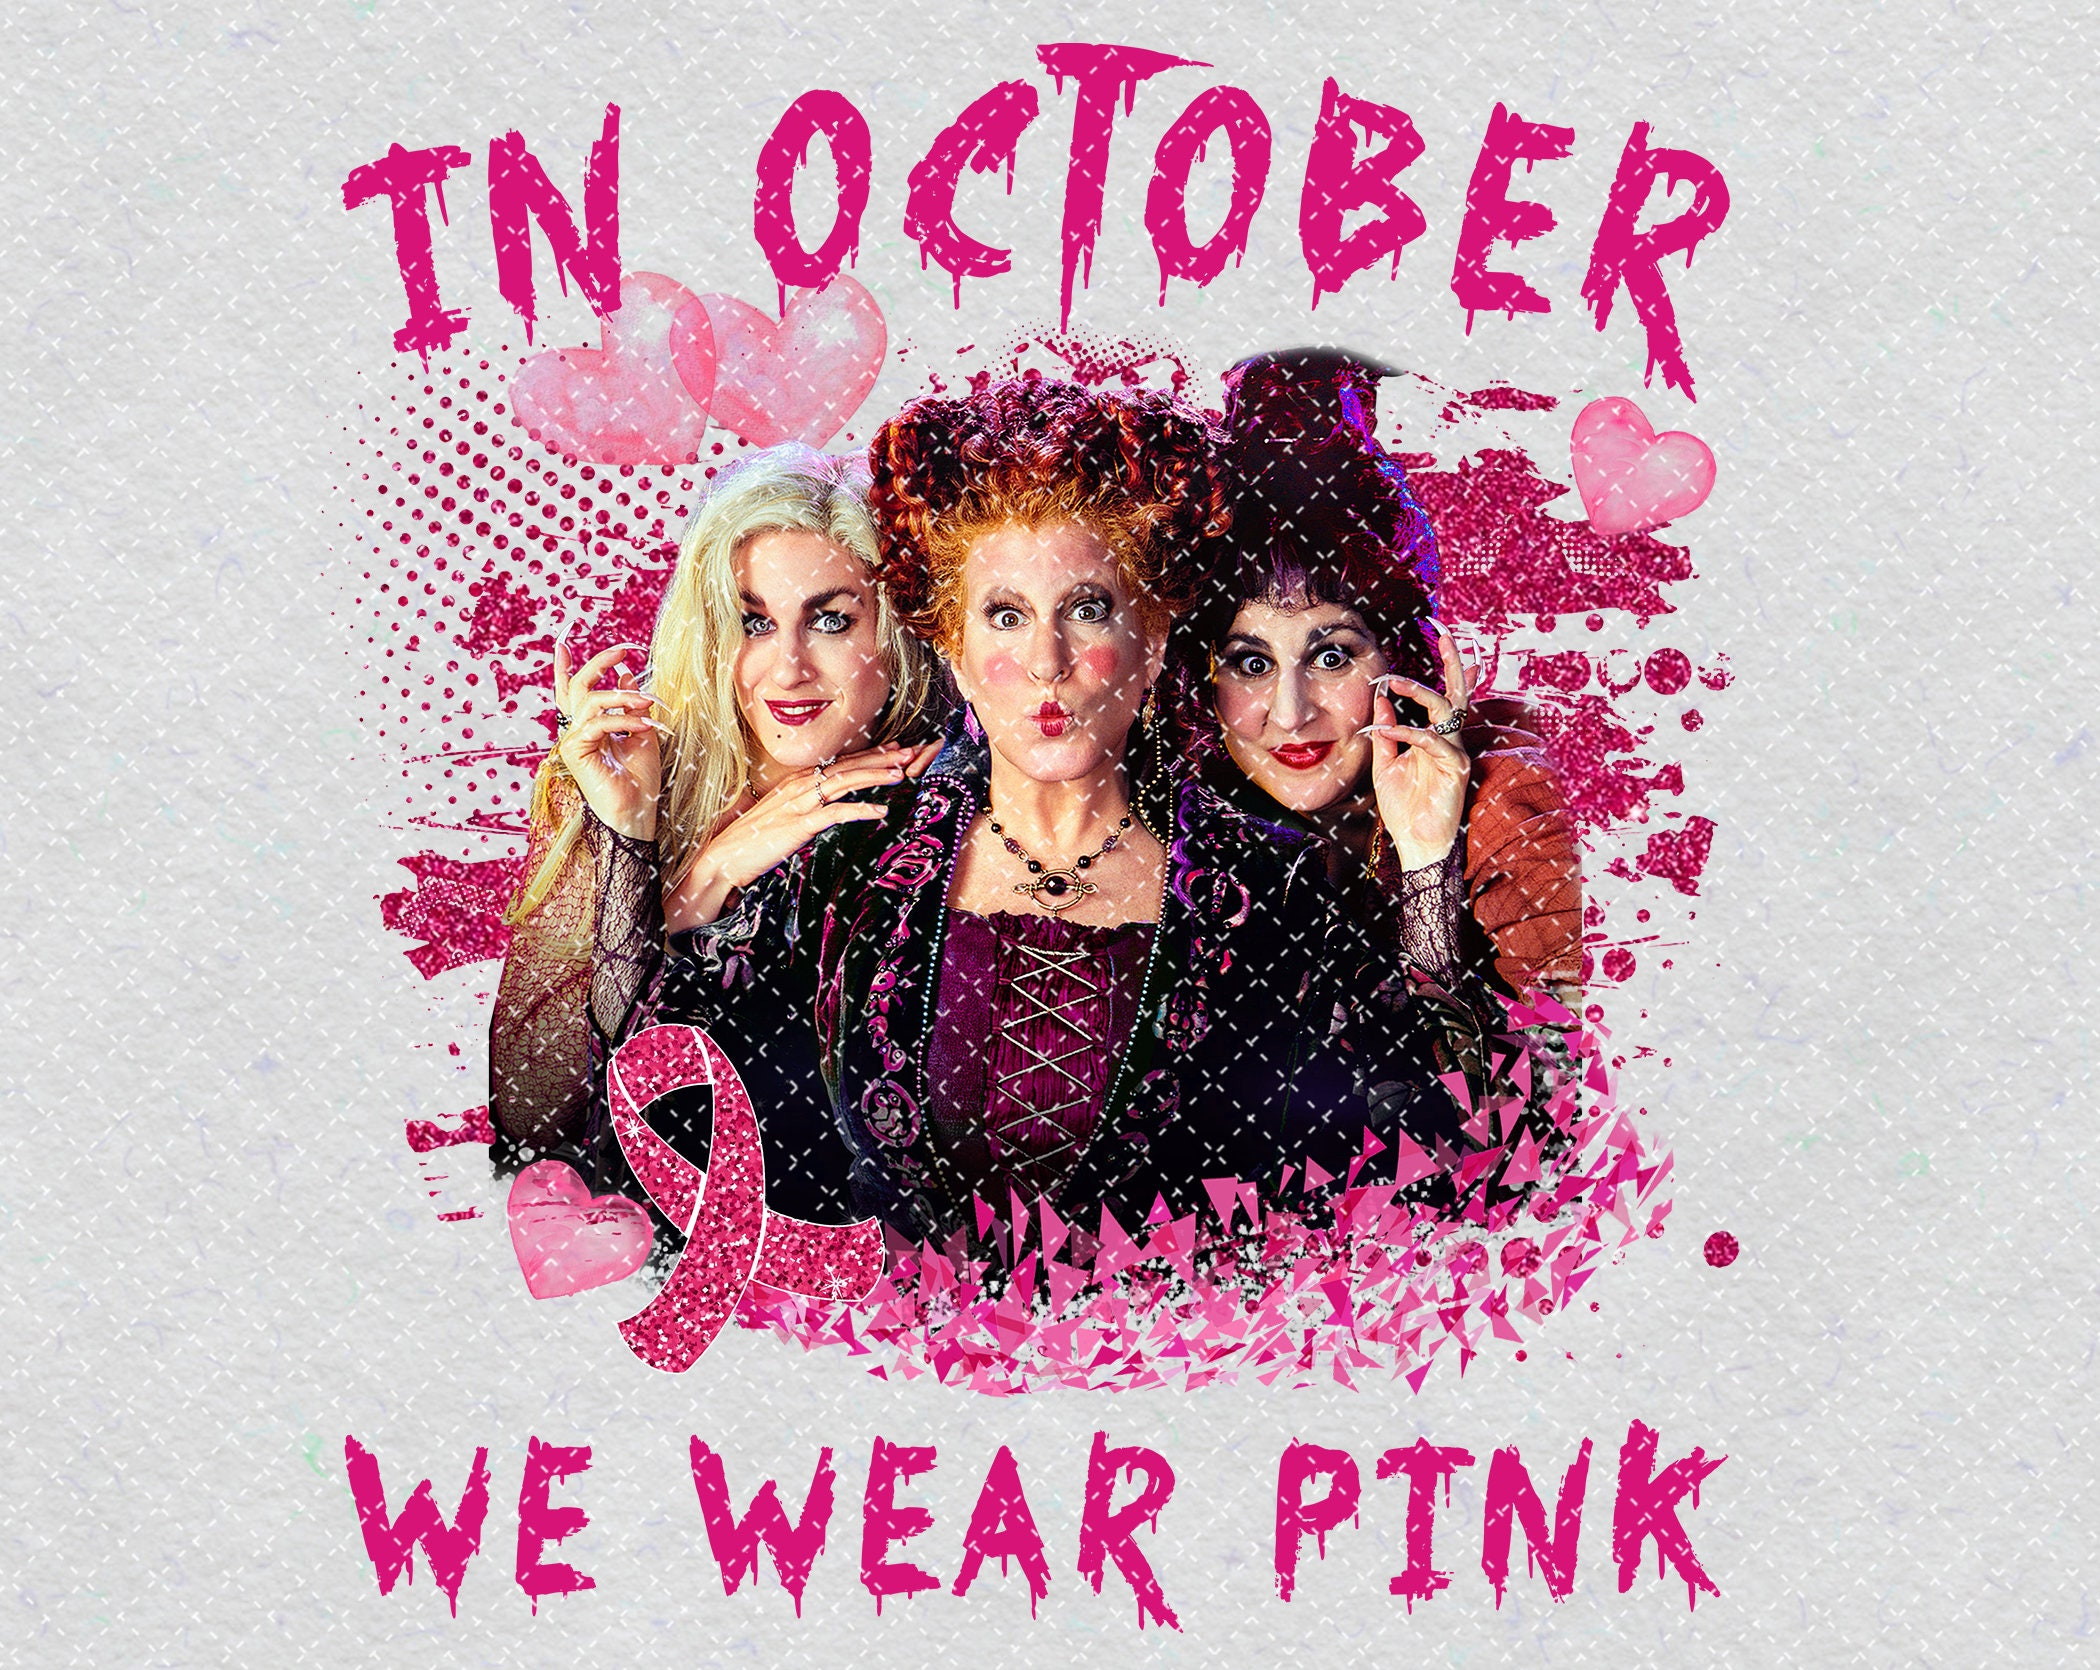 Hocus Pocus In October We Wear Pink PNG Printable, Horror Characters, Happy Halloween, Hocus Pocus Gift, Halloween Gift, SublimationPrinting